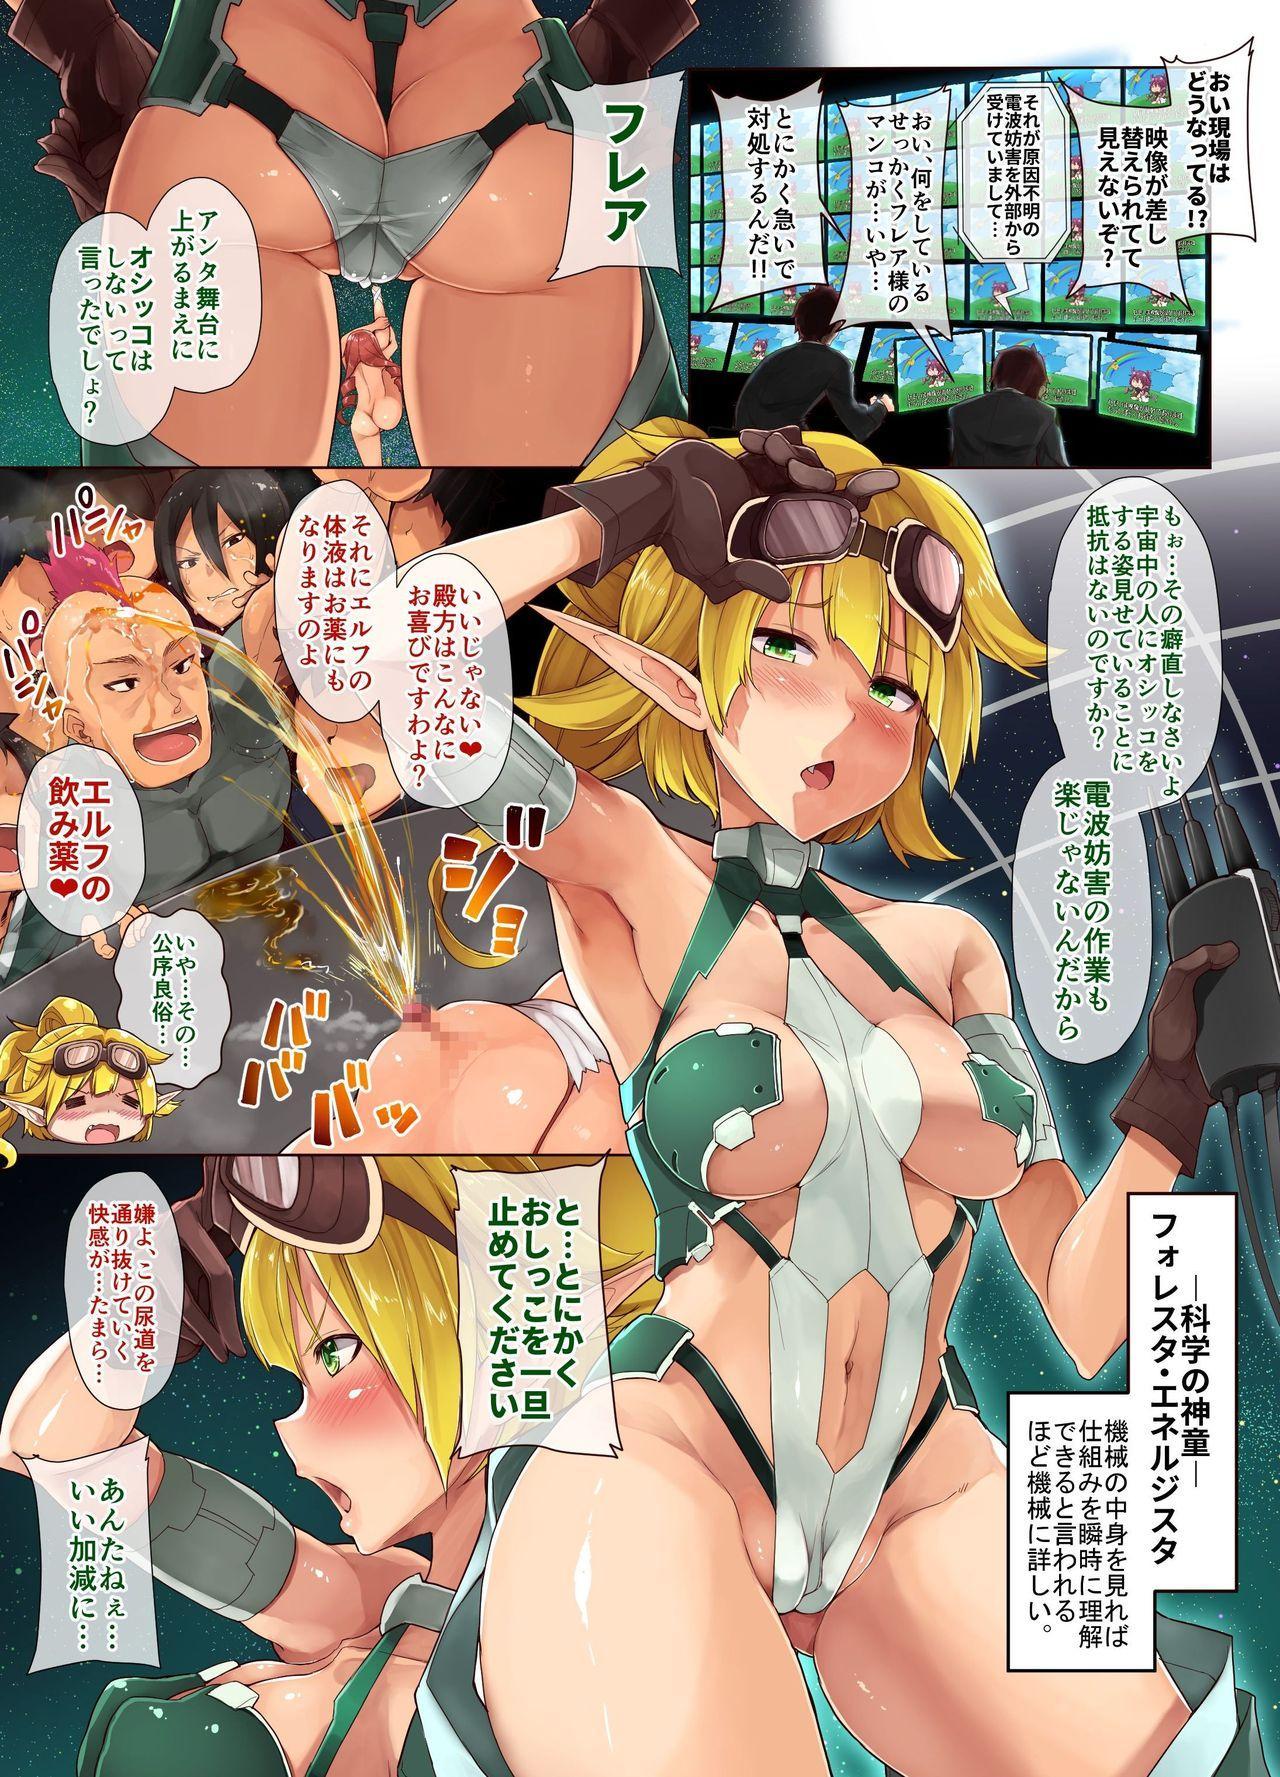 Zecchou Heroine Kairaku Zeme 4